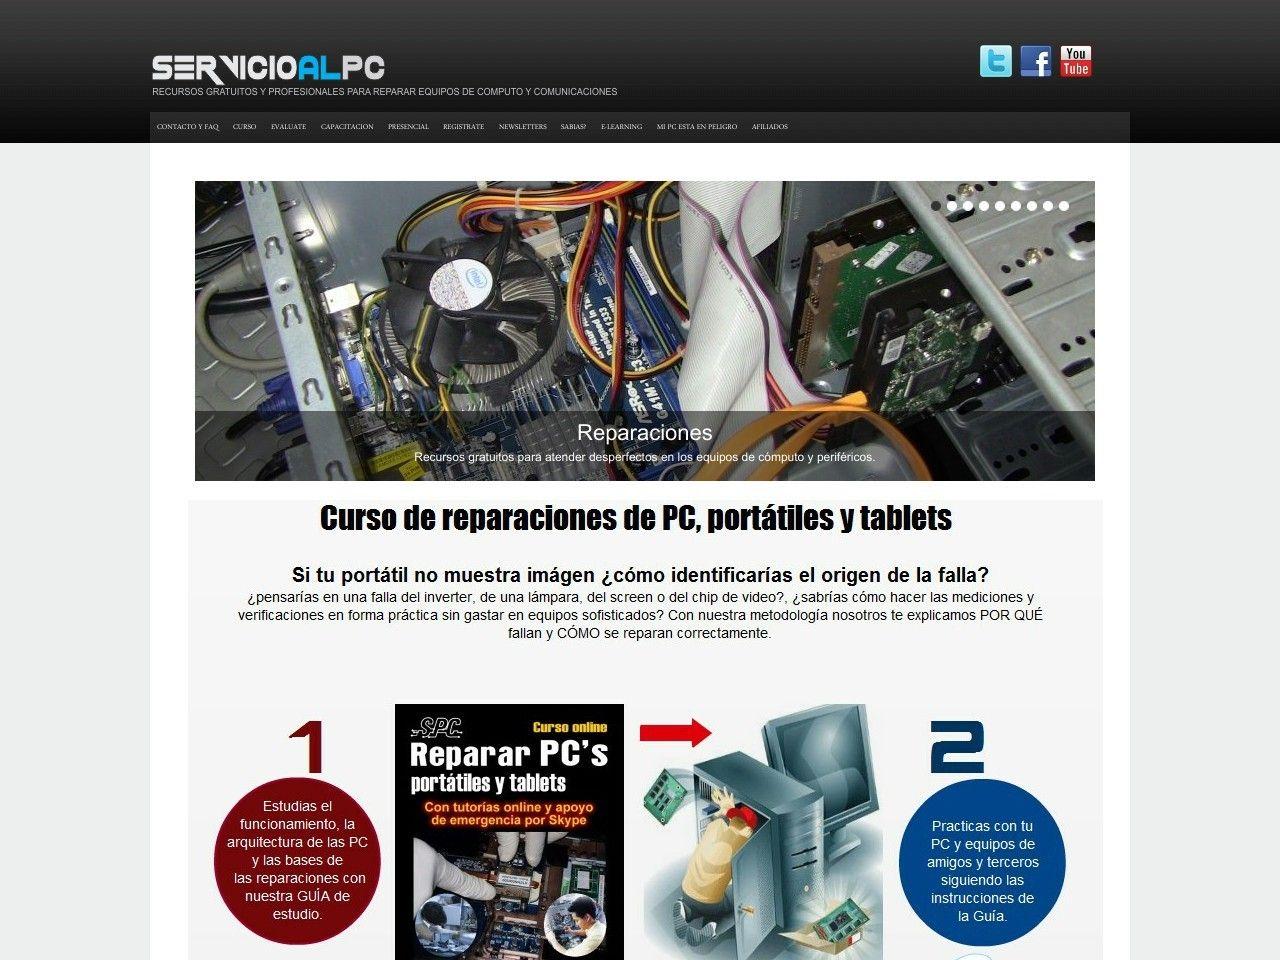 ① Reparar Pc's Portátiles Y Tablets - http://www.vnulab.be/lab-review/%e2%91%a0-reparar-pcs-portatiles-y-tablets